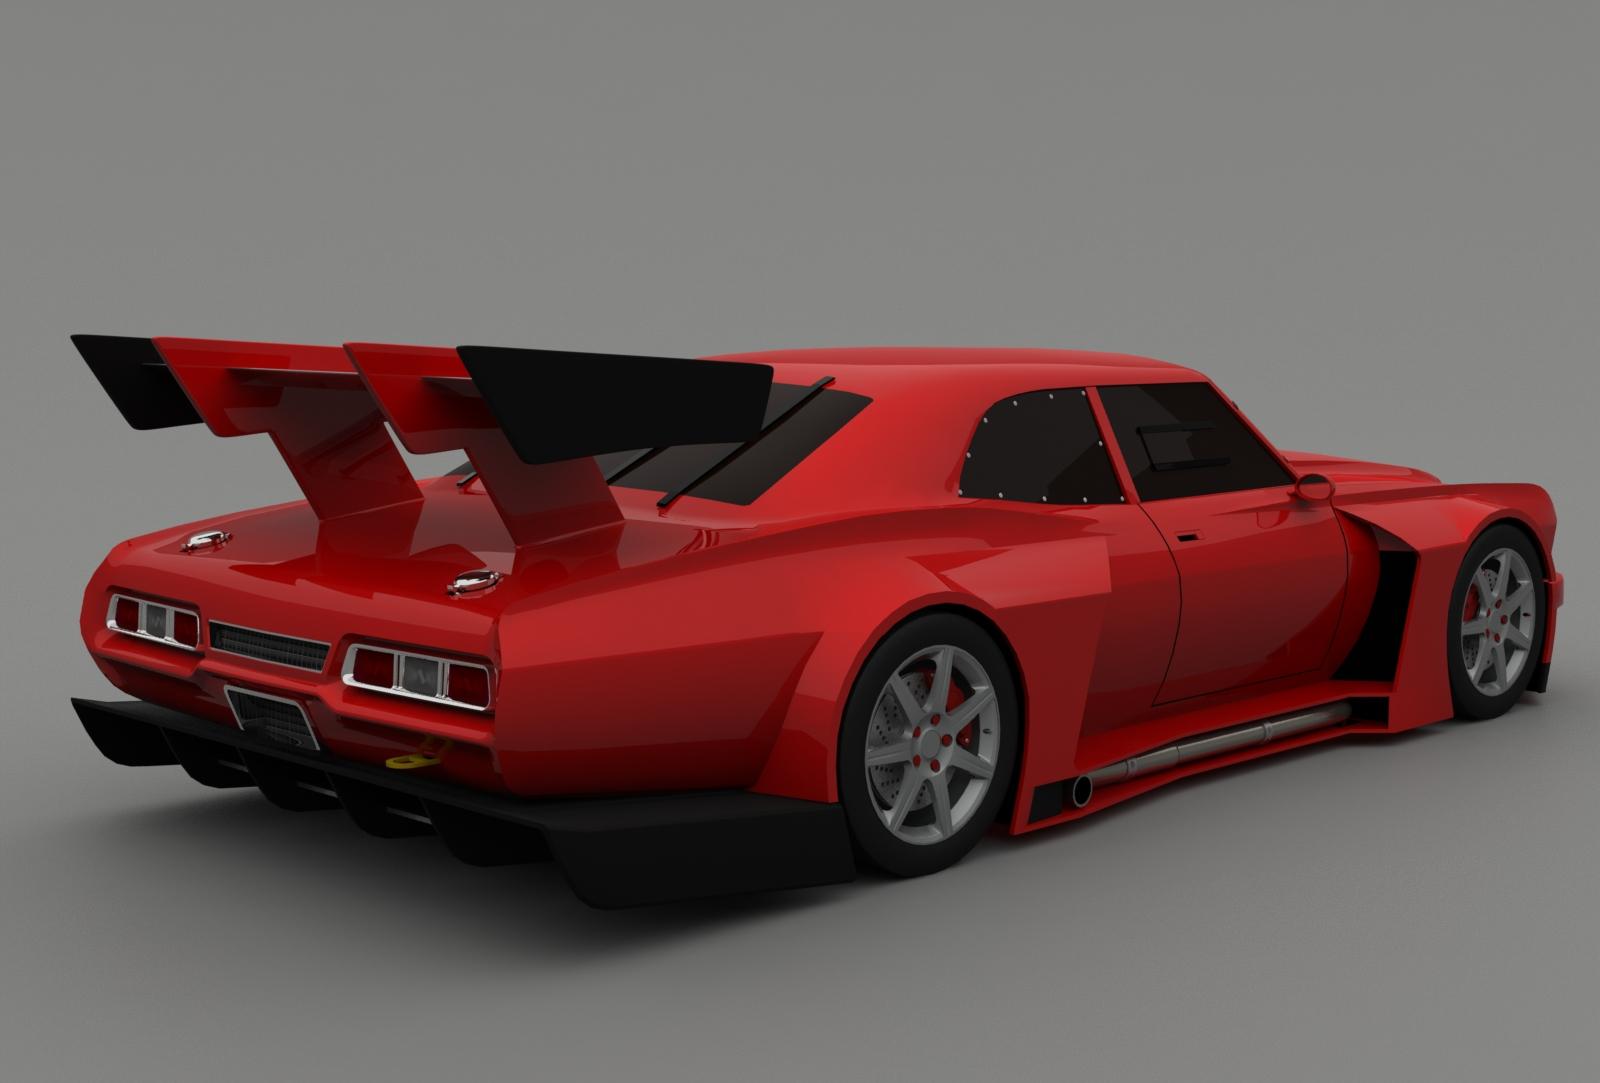 2013-03_The Crew_F.Beudin_Chevrolet Impala-1967-Racing2 Design_06